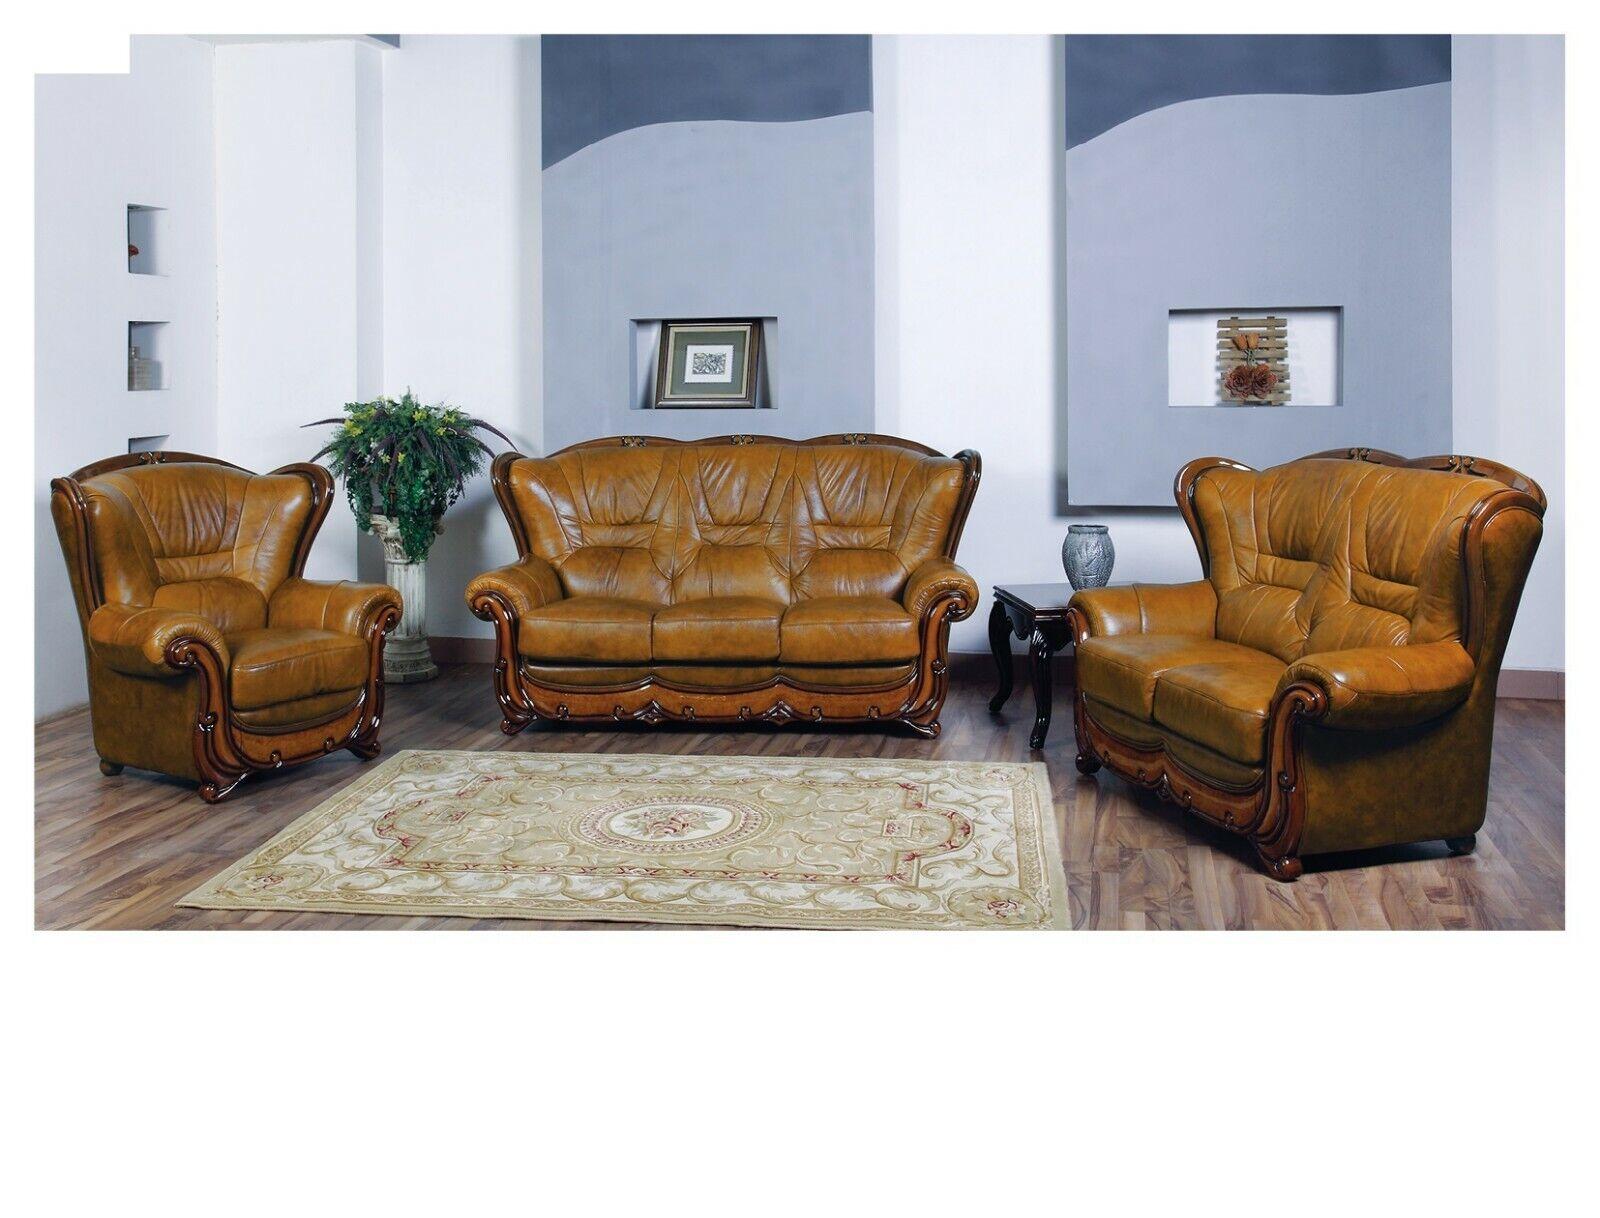 Miraculous Esf 100 Living Room Set Sofa Loveseat And Chair In Genuine Italian Leather Interior Design Ideas Skatsoteloinfo